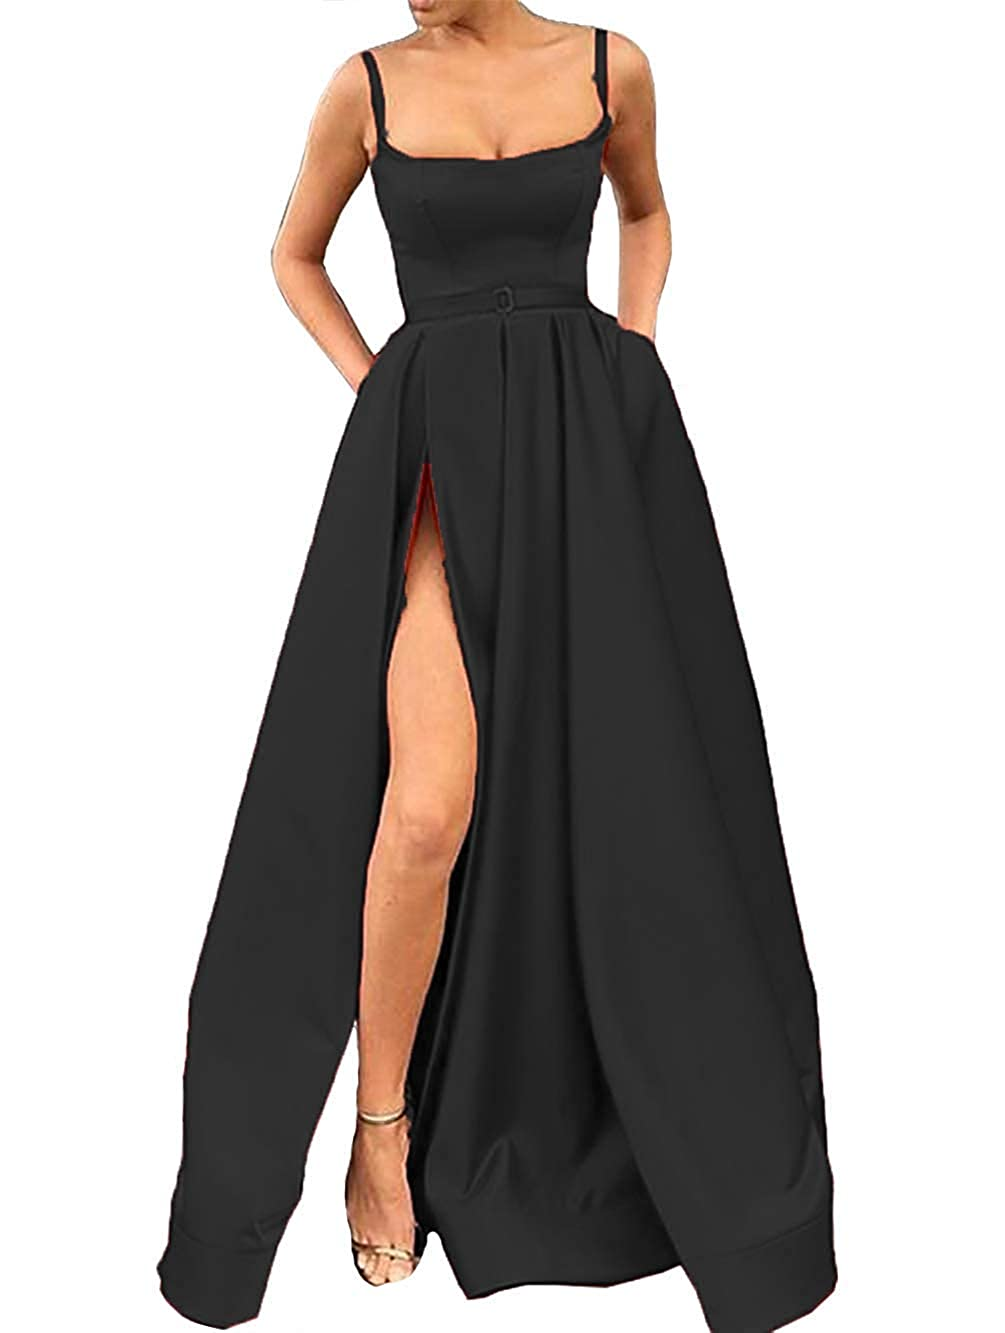 Black XSWPL Sexy Side Split Prom Dresses Long Spaghetti Straps Satin Evening Dress with Pockets